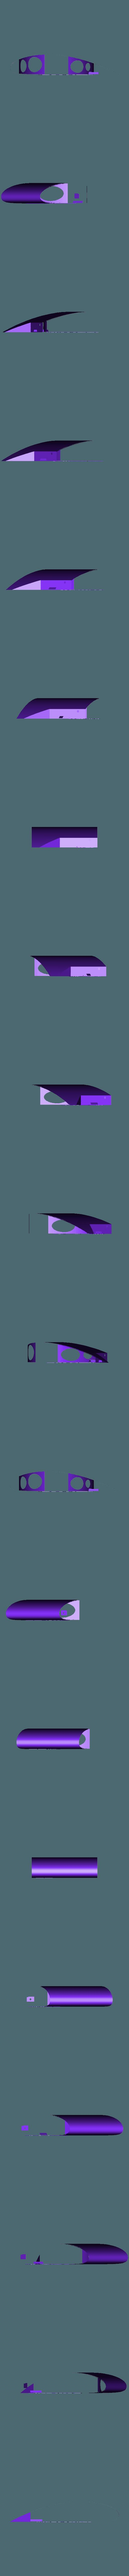 WINGTEST_p3.stl Download free STL file 3D rc plane savage bobber • Object to 3D print, ederhannes